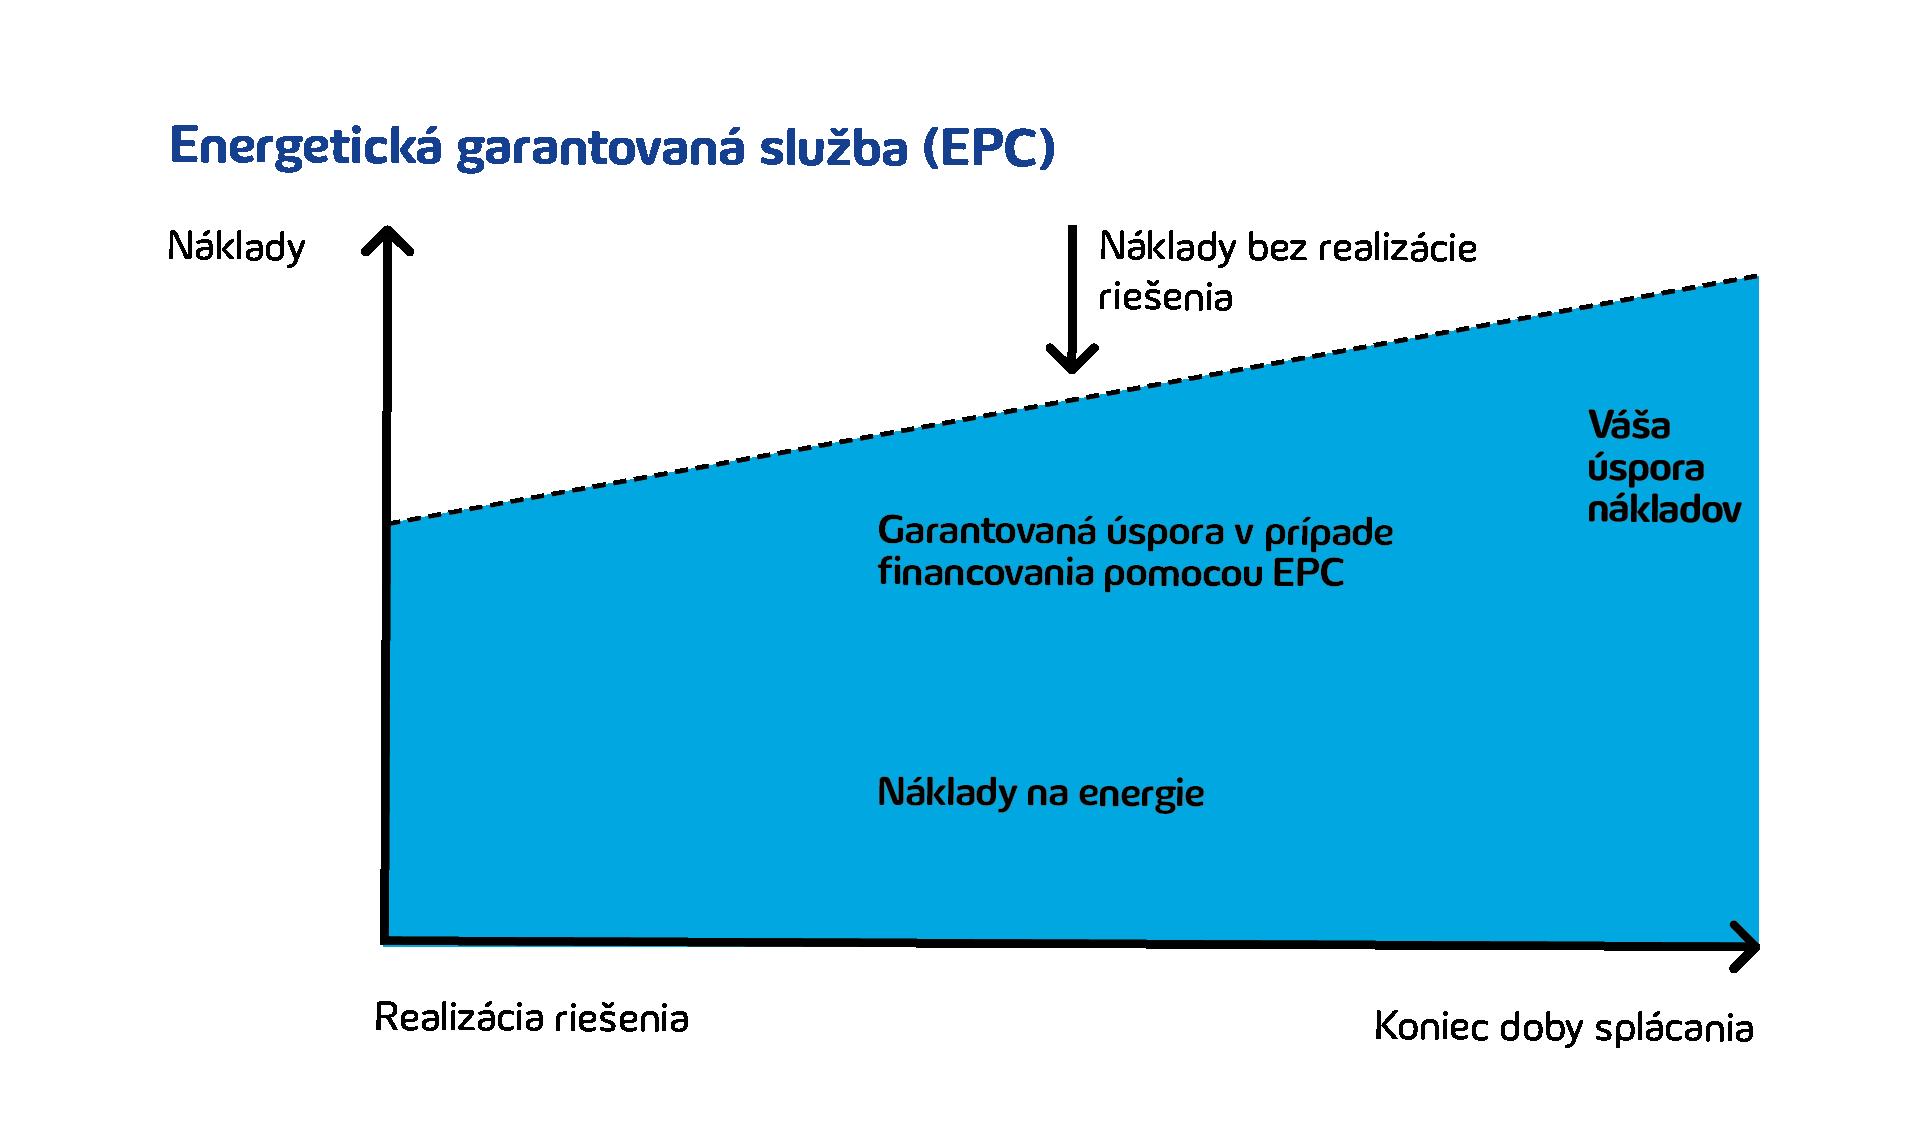 Energeticke riesenia graf